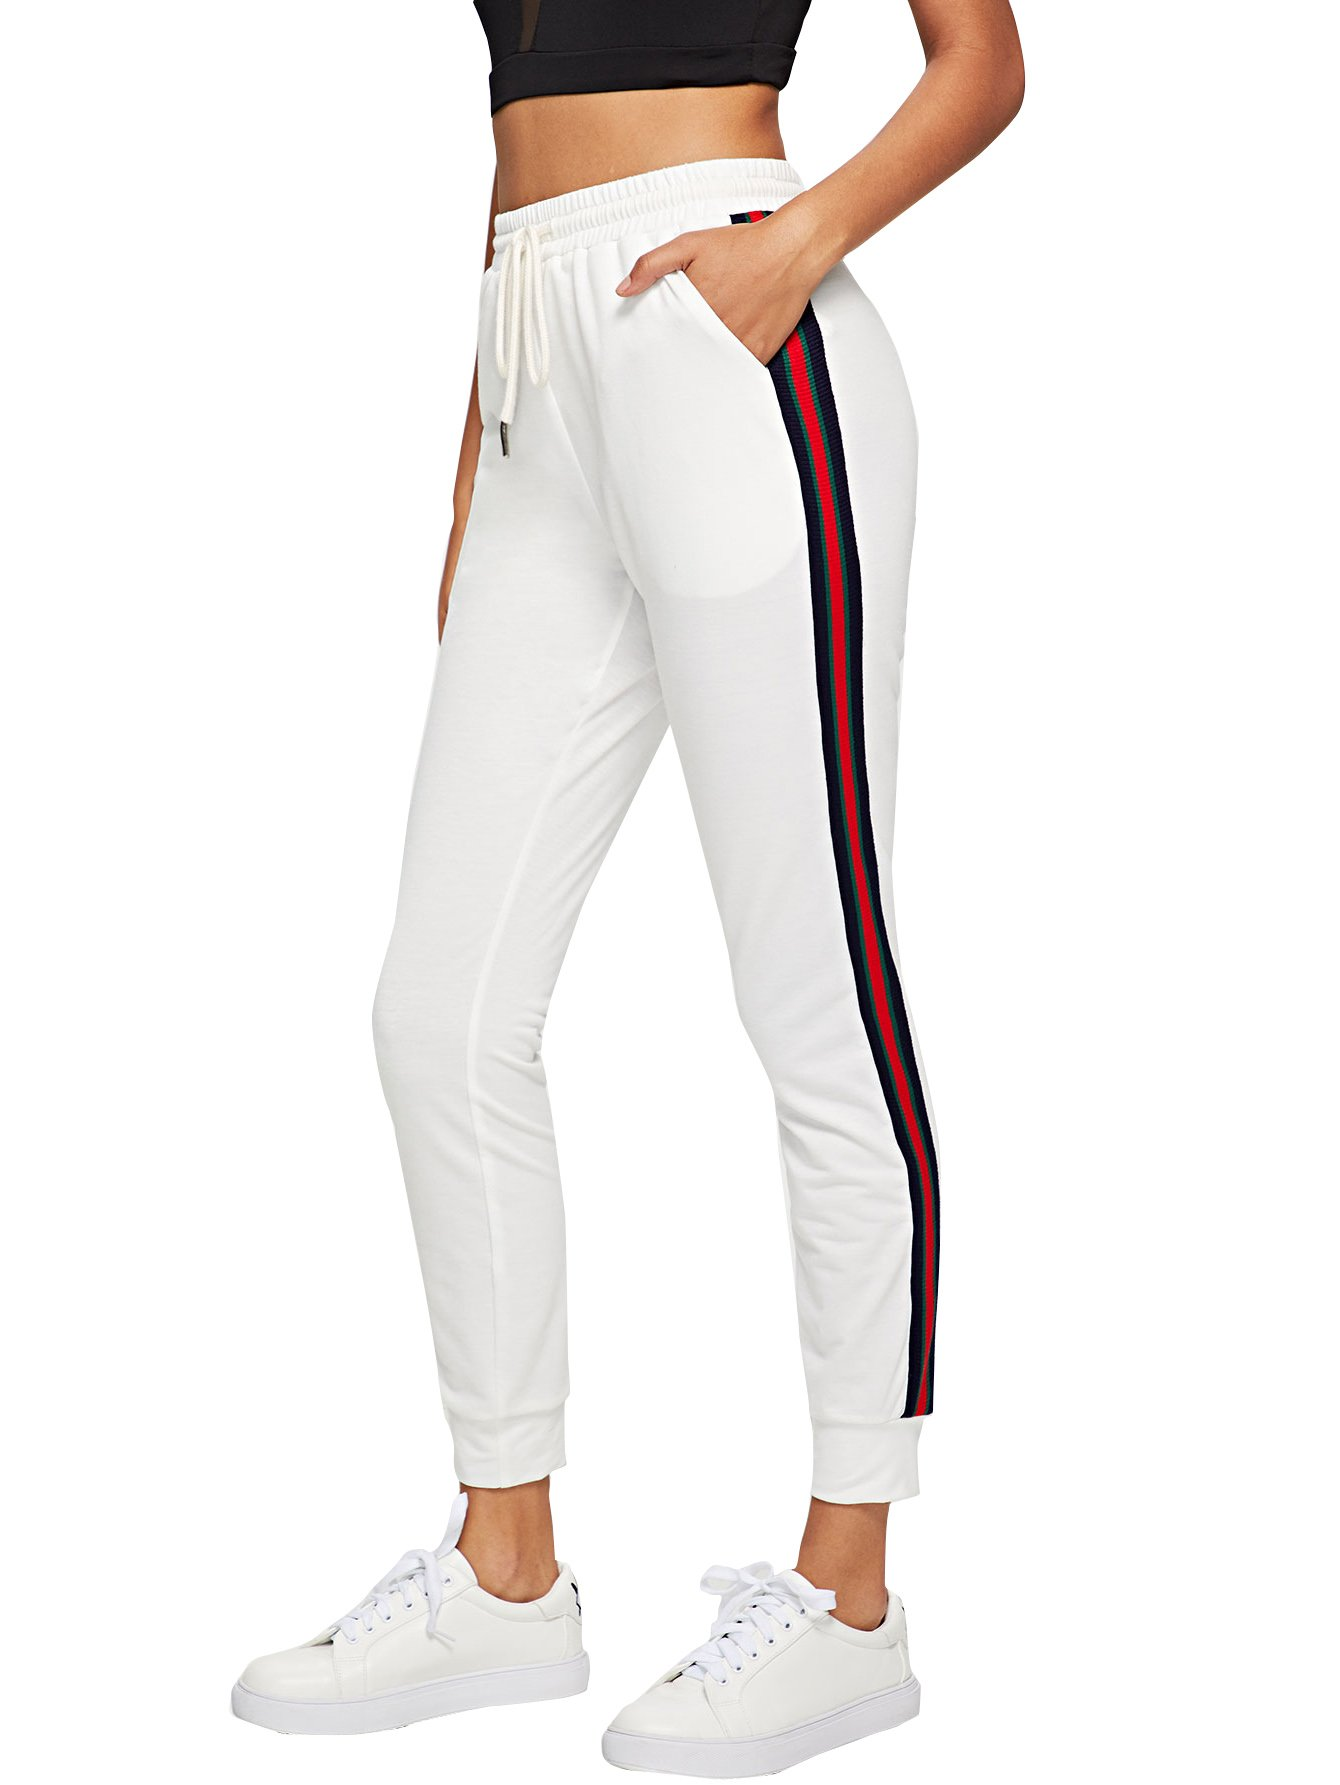 5c8c84a6e7f SOLY HUX Women's Striped Tape Side Drawstring Sweatpants Joggers Pants  White M